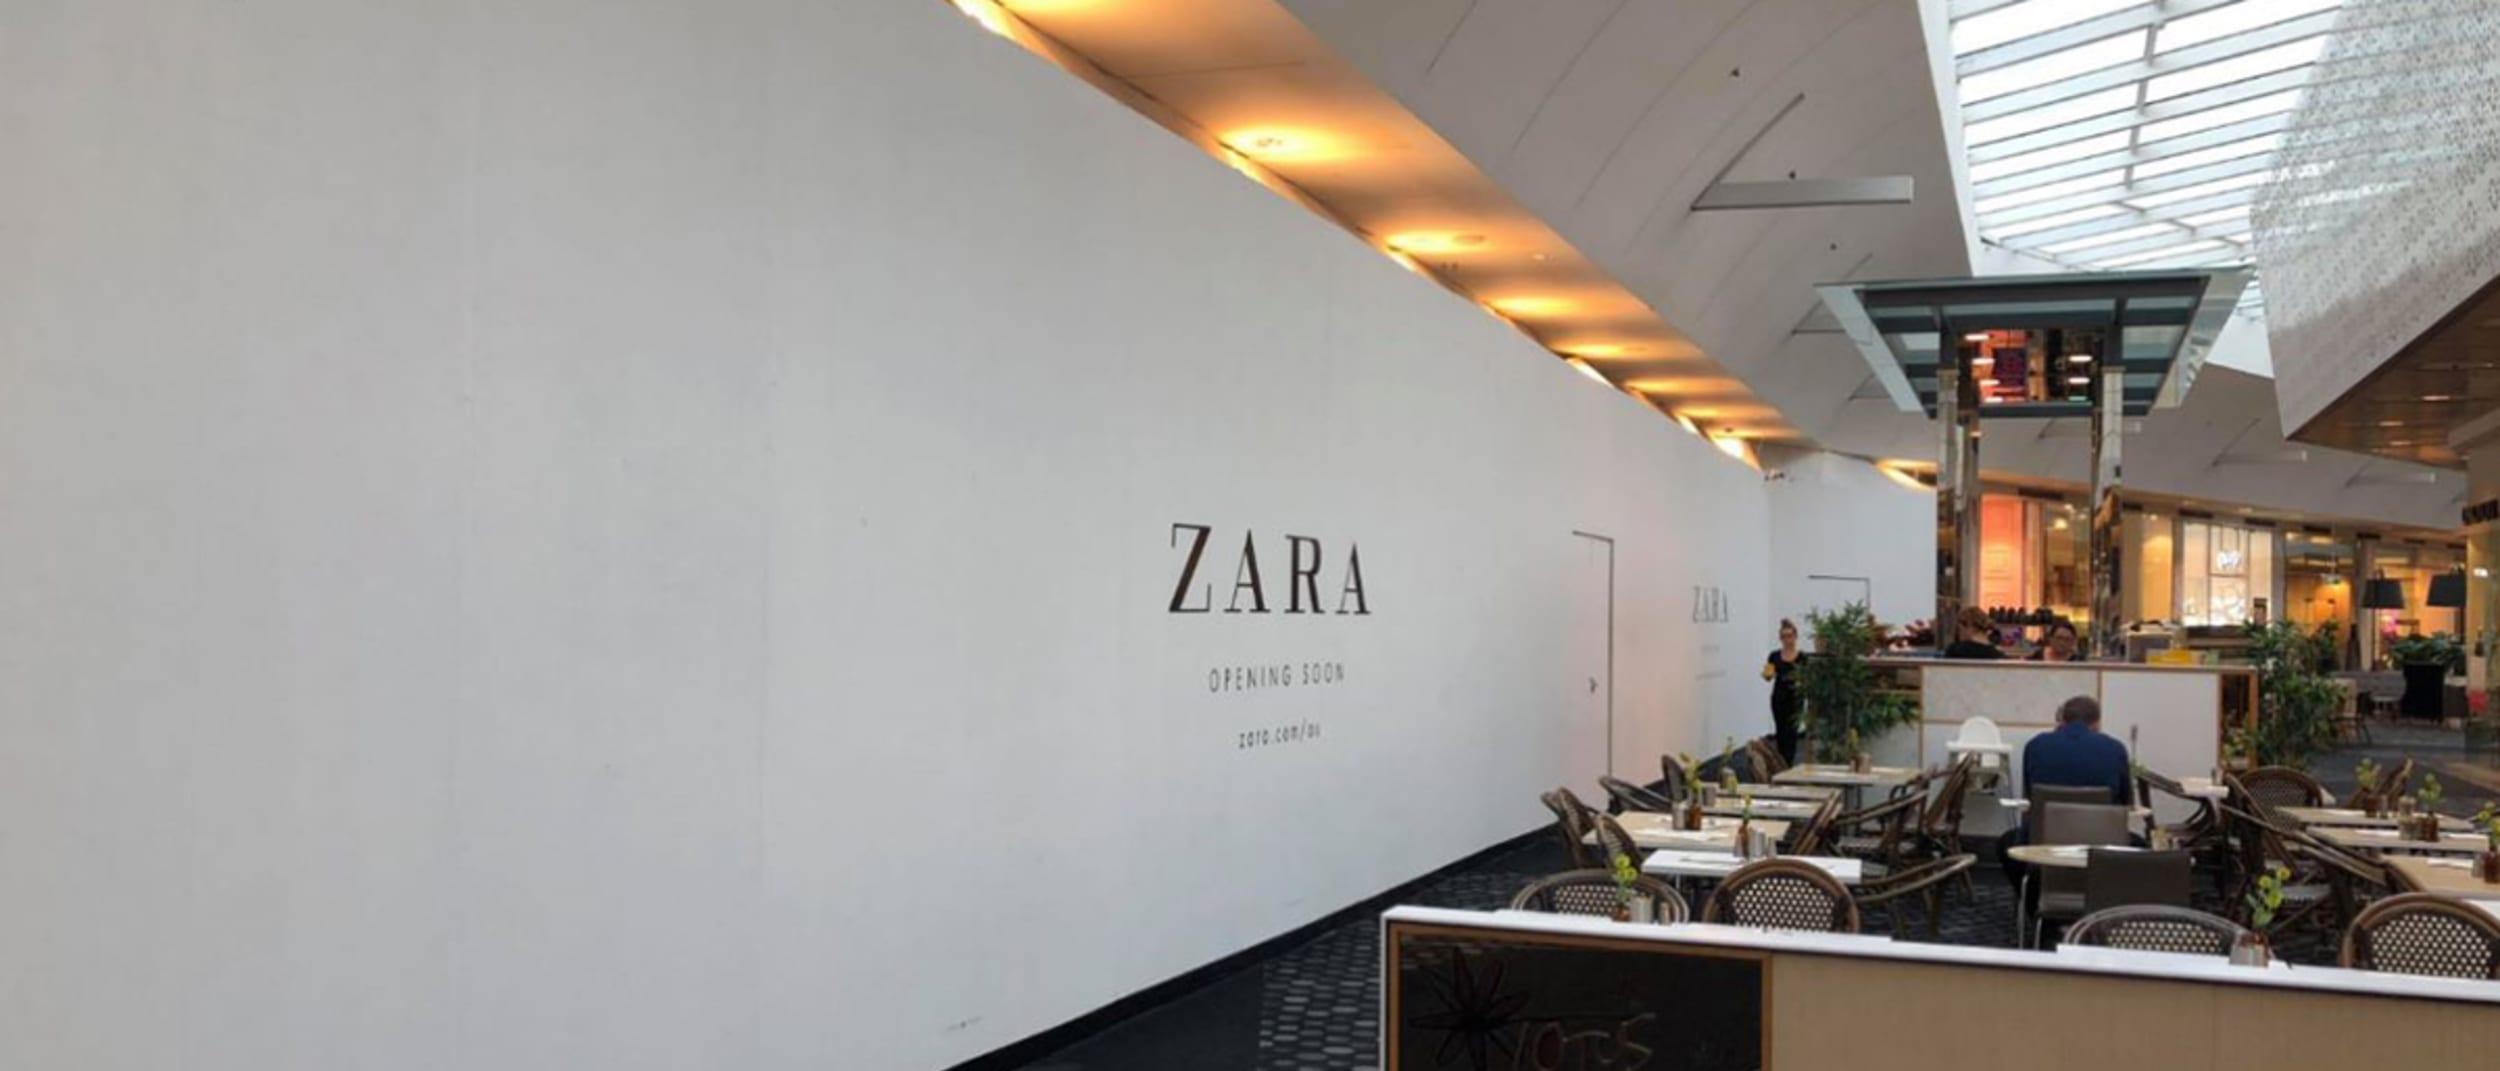 Zara opening soon